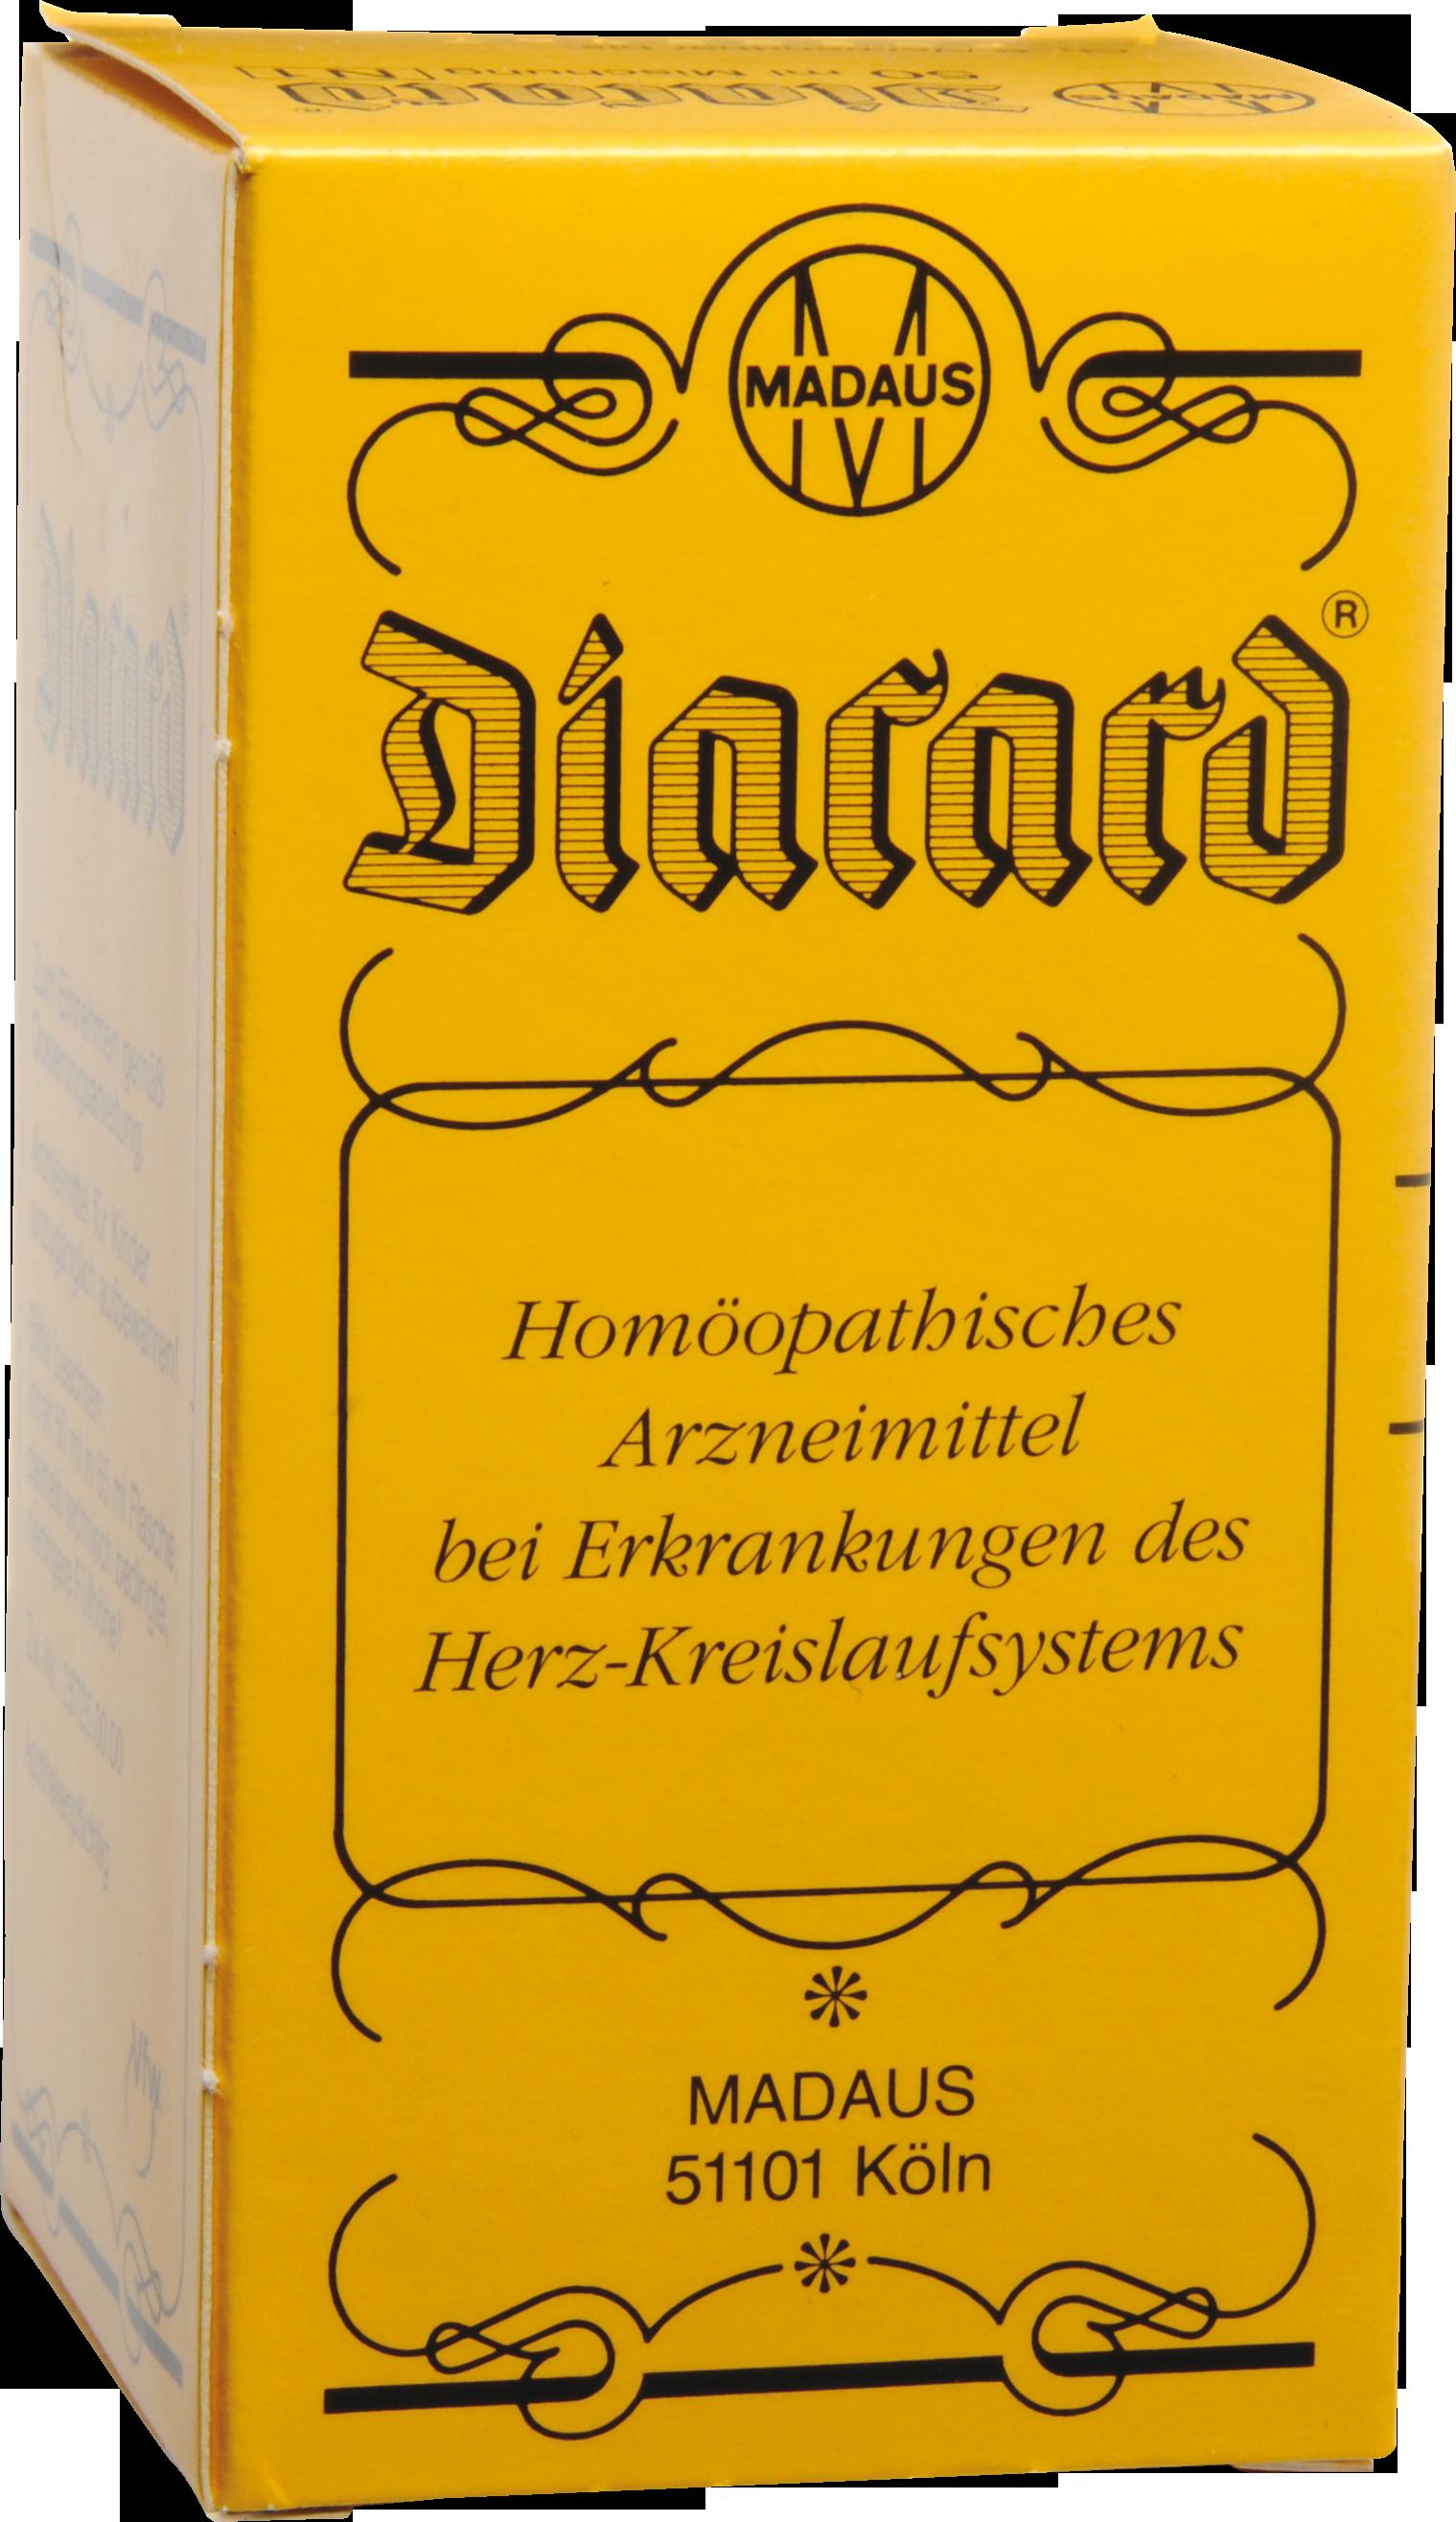 Diacard